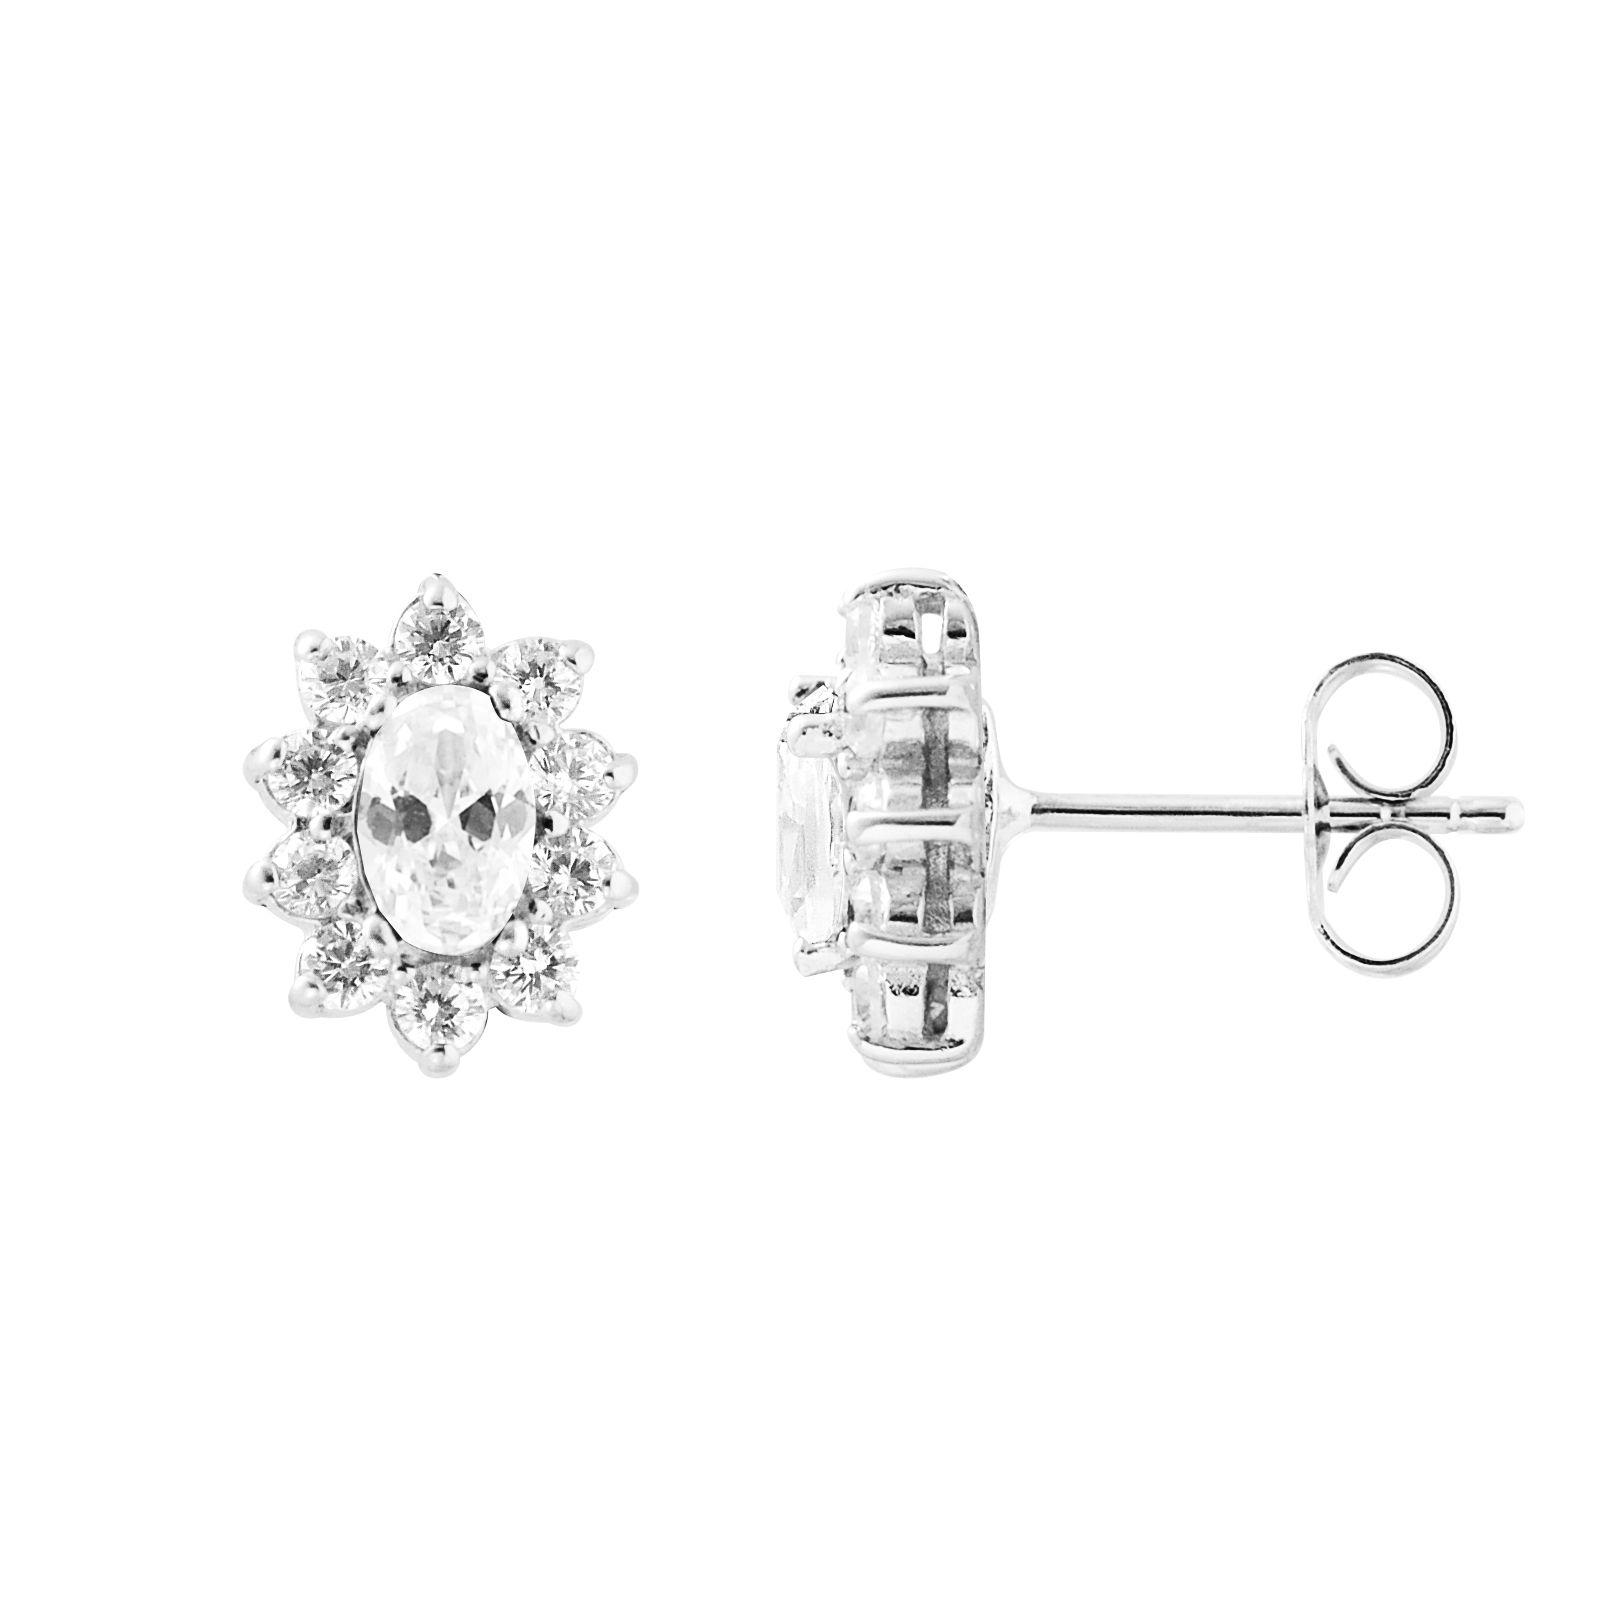 DIADEMA - Earrings - Crystal - Collection Crystal Pearl